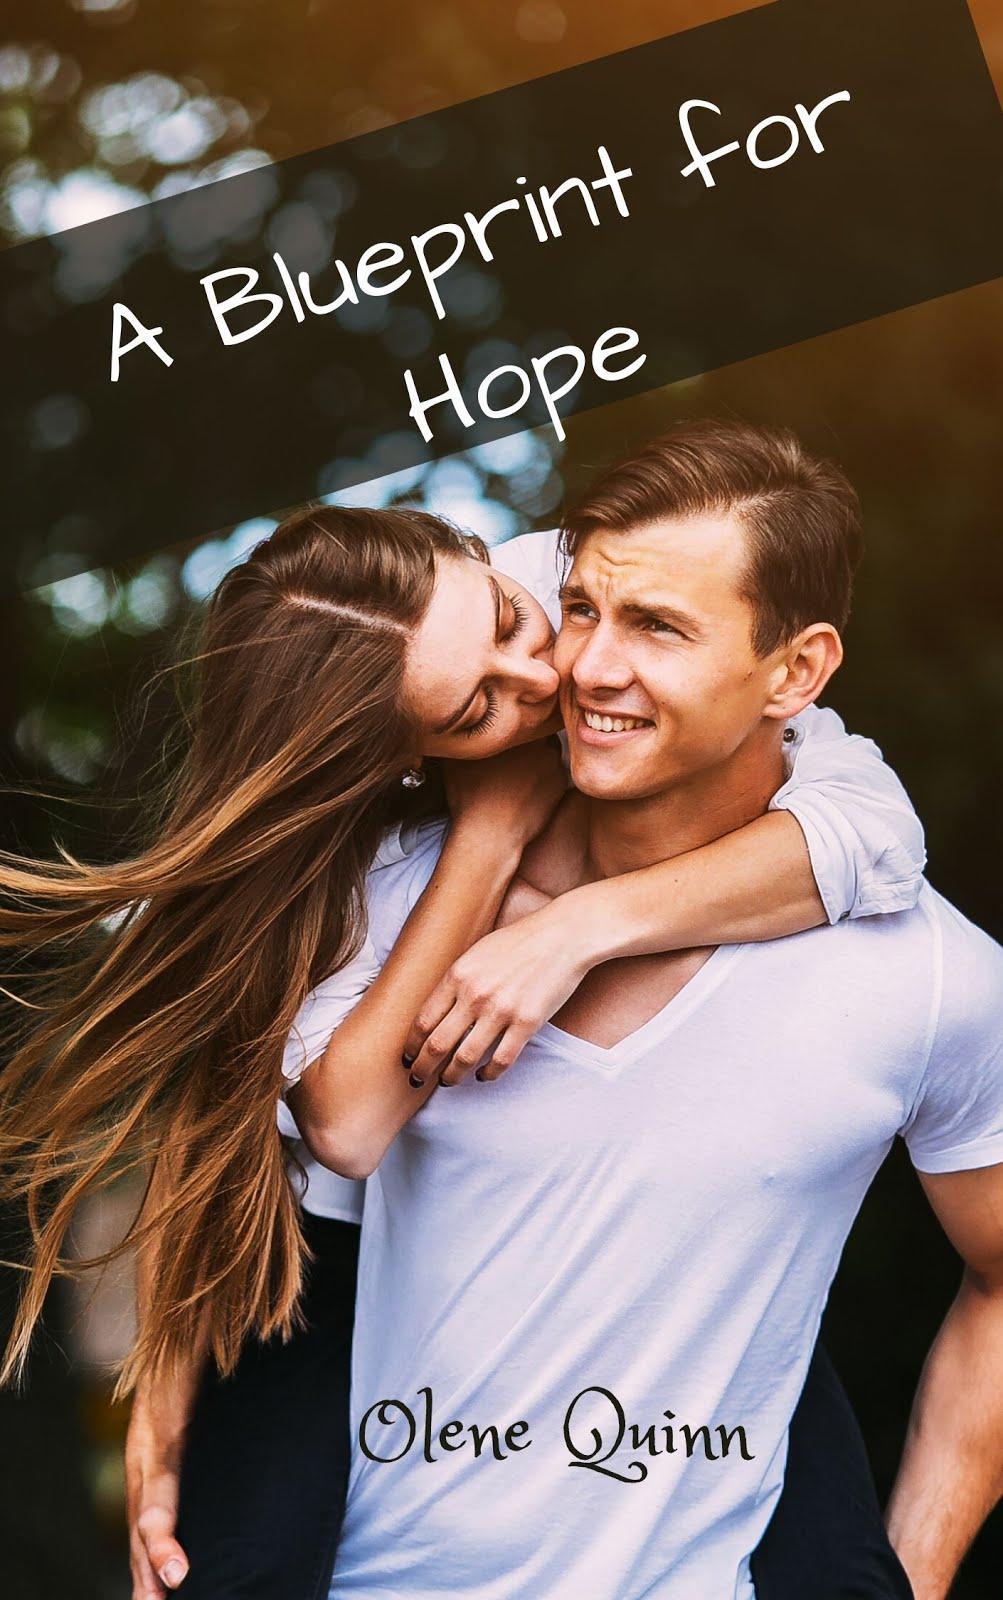 A Blueprint for Hope